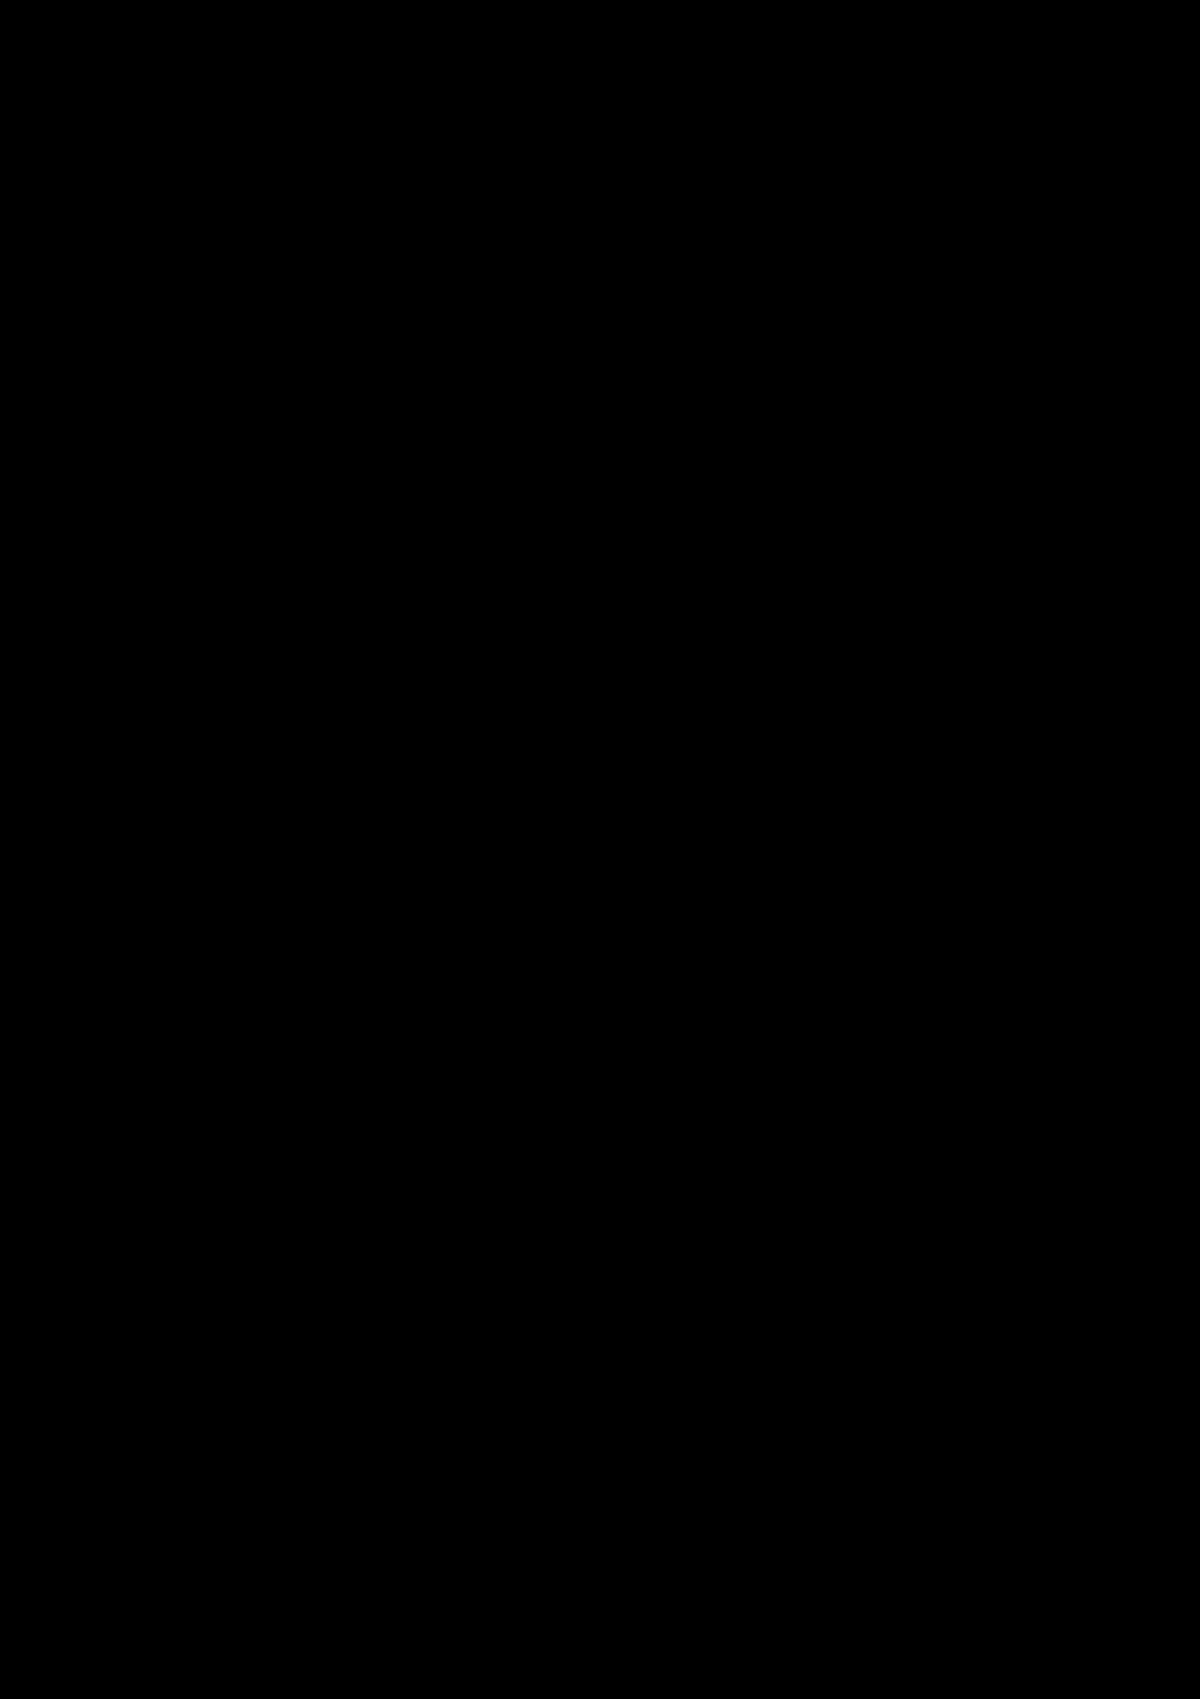 panelbig [Converted]